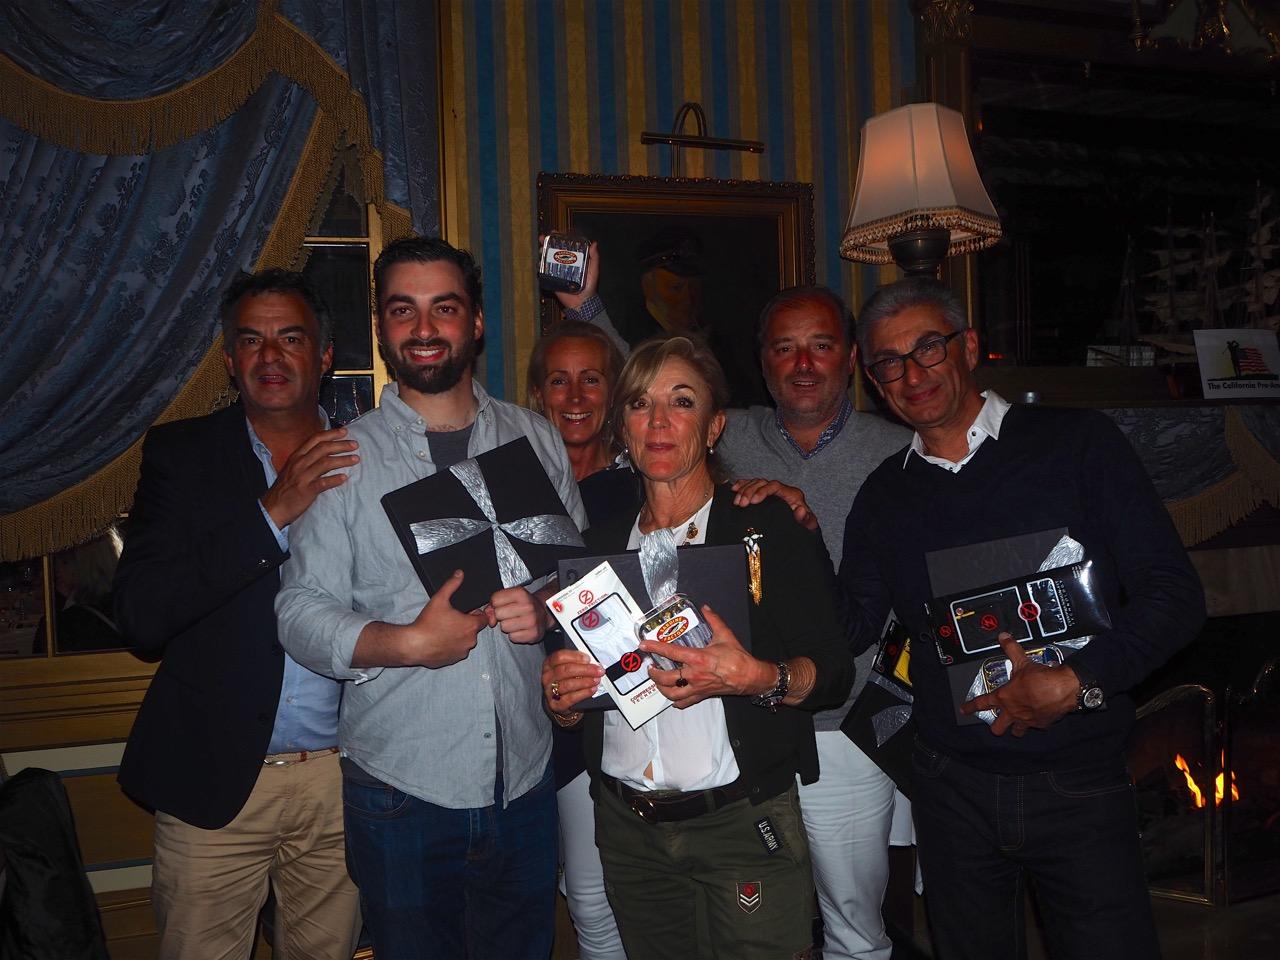 Les leaders en brut, Thomas Linard, Martine Haladjian, Olivier Masse et Serge Haladjian.